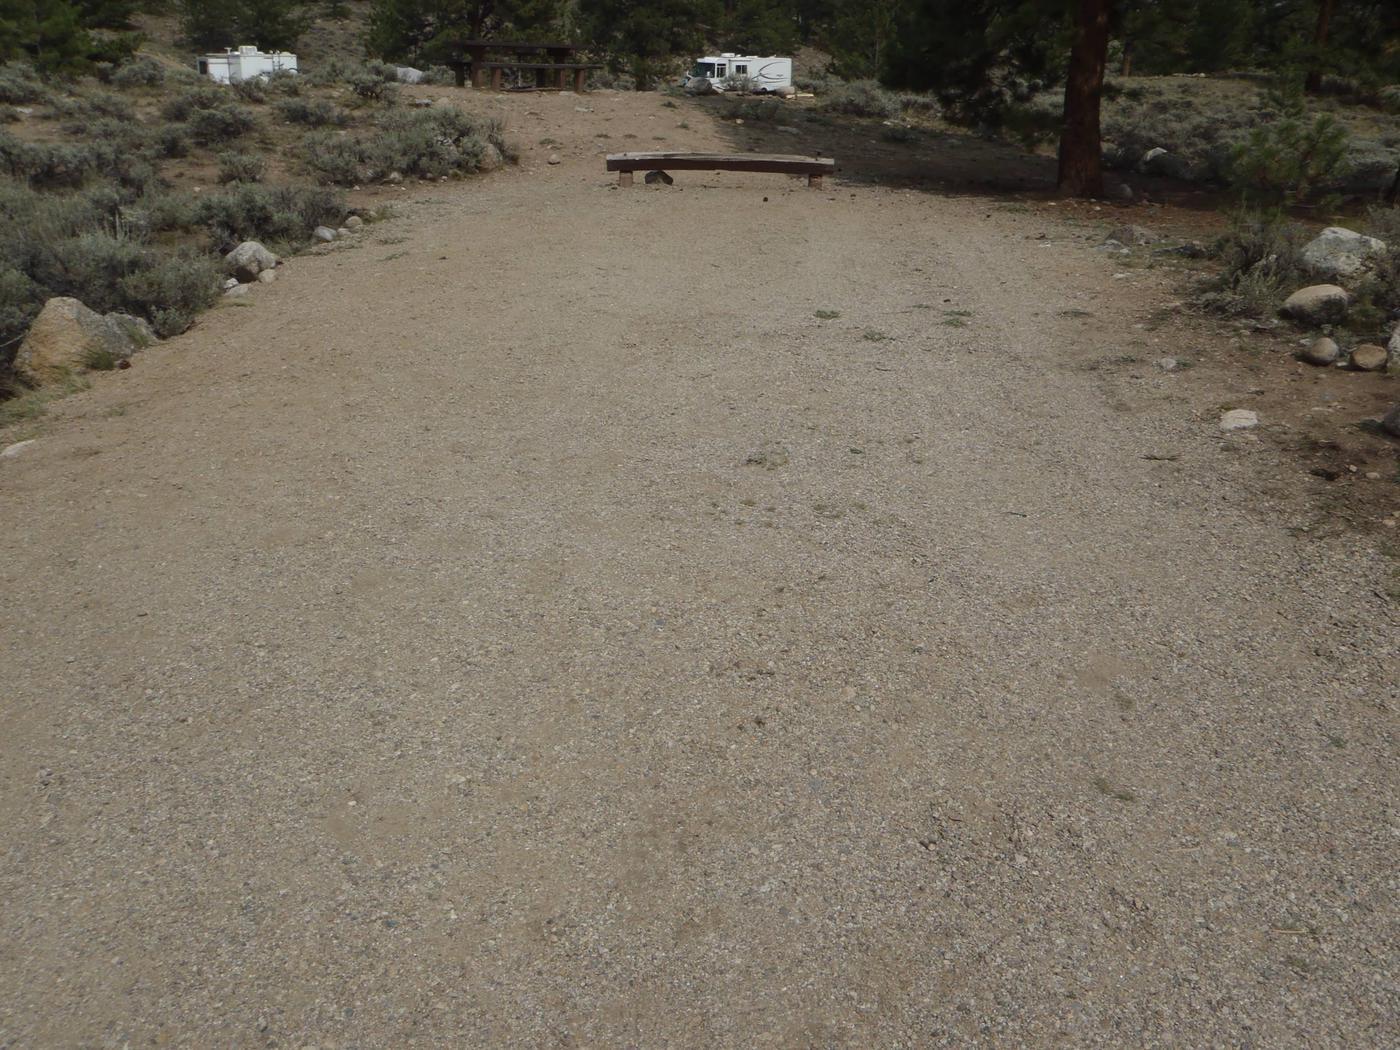 White Star Campground, site 47 parking